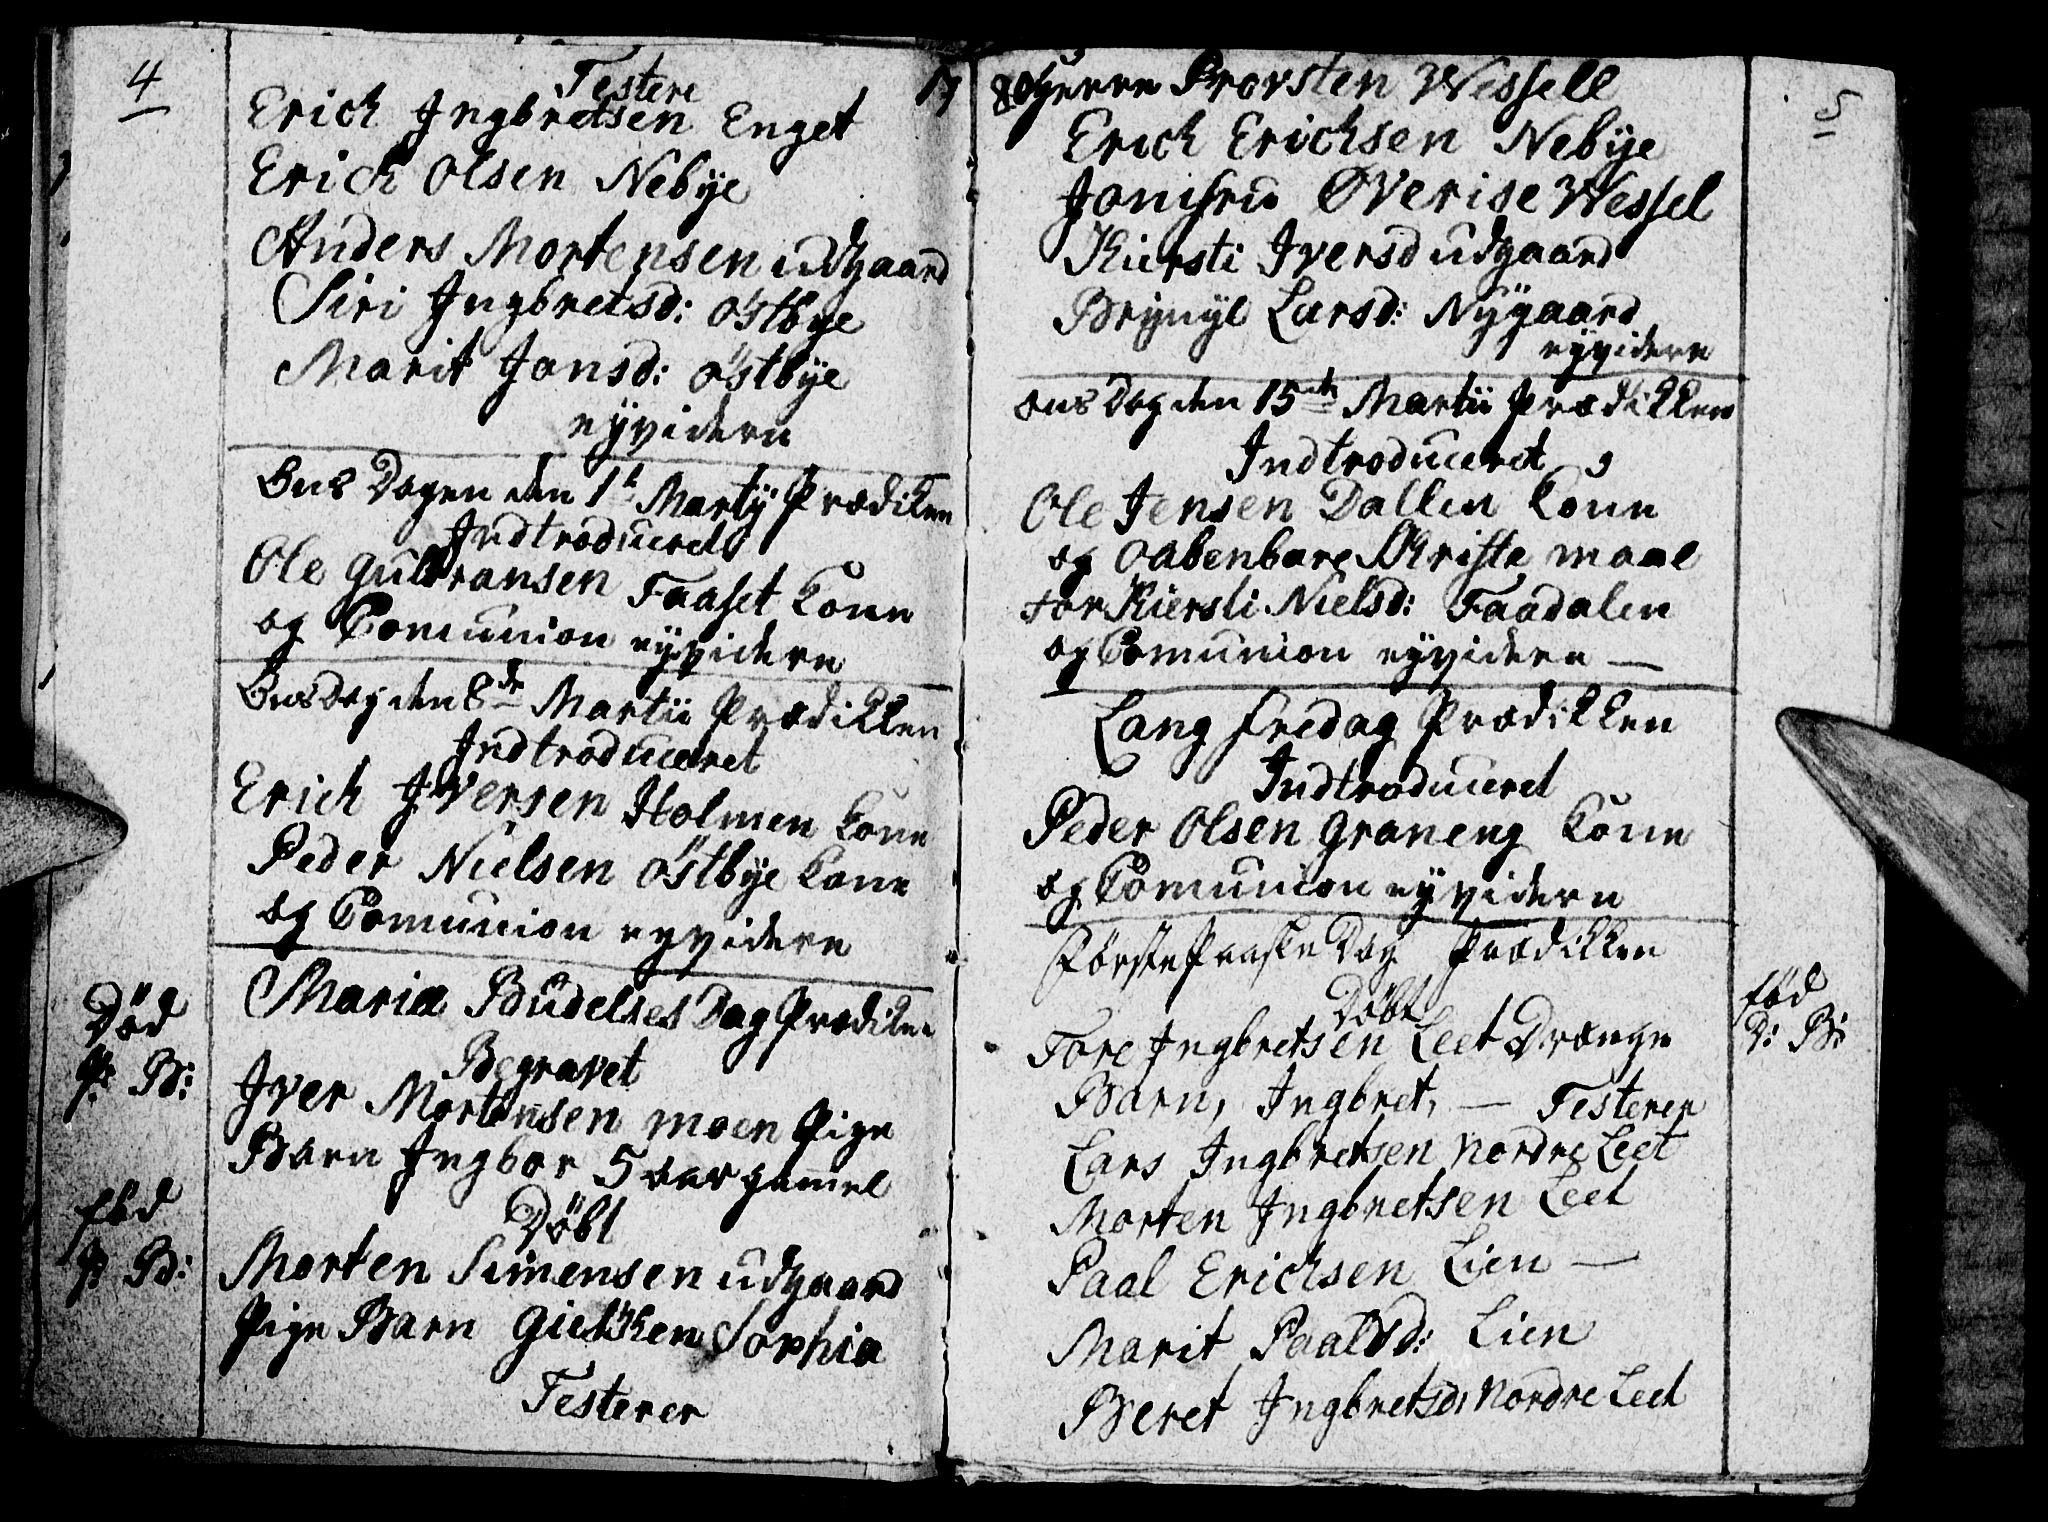 SAH, Tynset prestekontor, Ministerialbok nr. 12, 1780-1784, s. 4-5